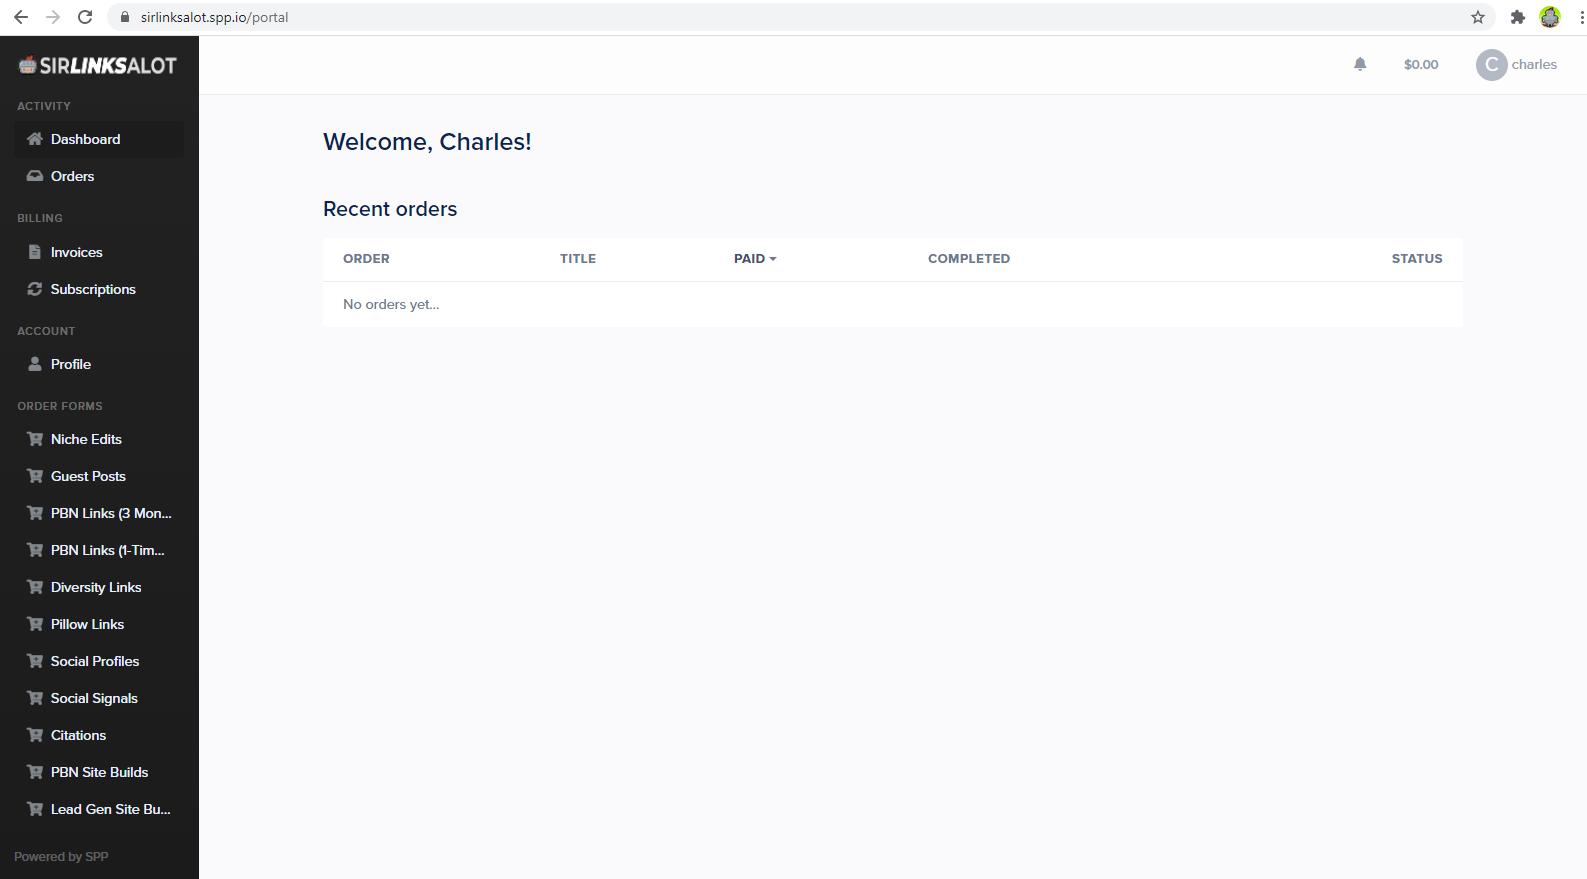 The SirLinksalot client portal.